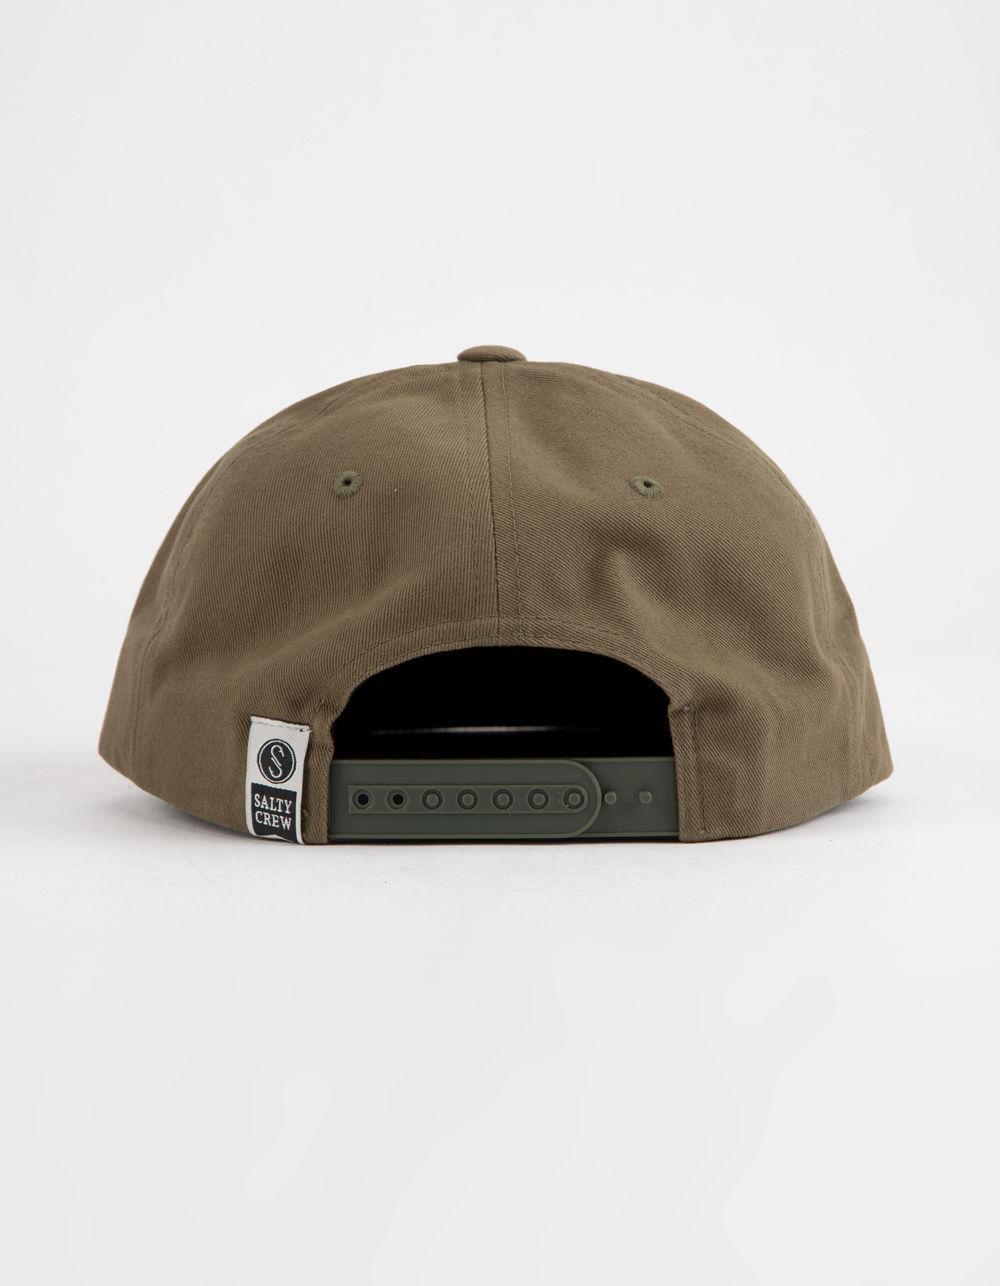 555521780586f Lyst - Salty Crew Floater Loden Sna Mens Snapback Hat for Men